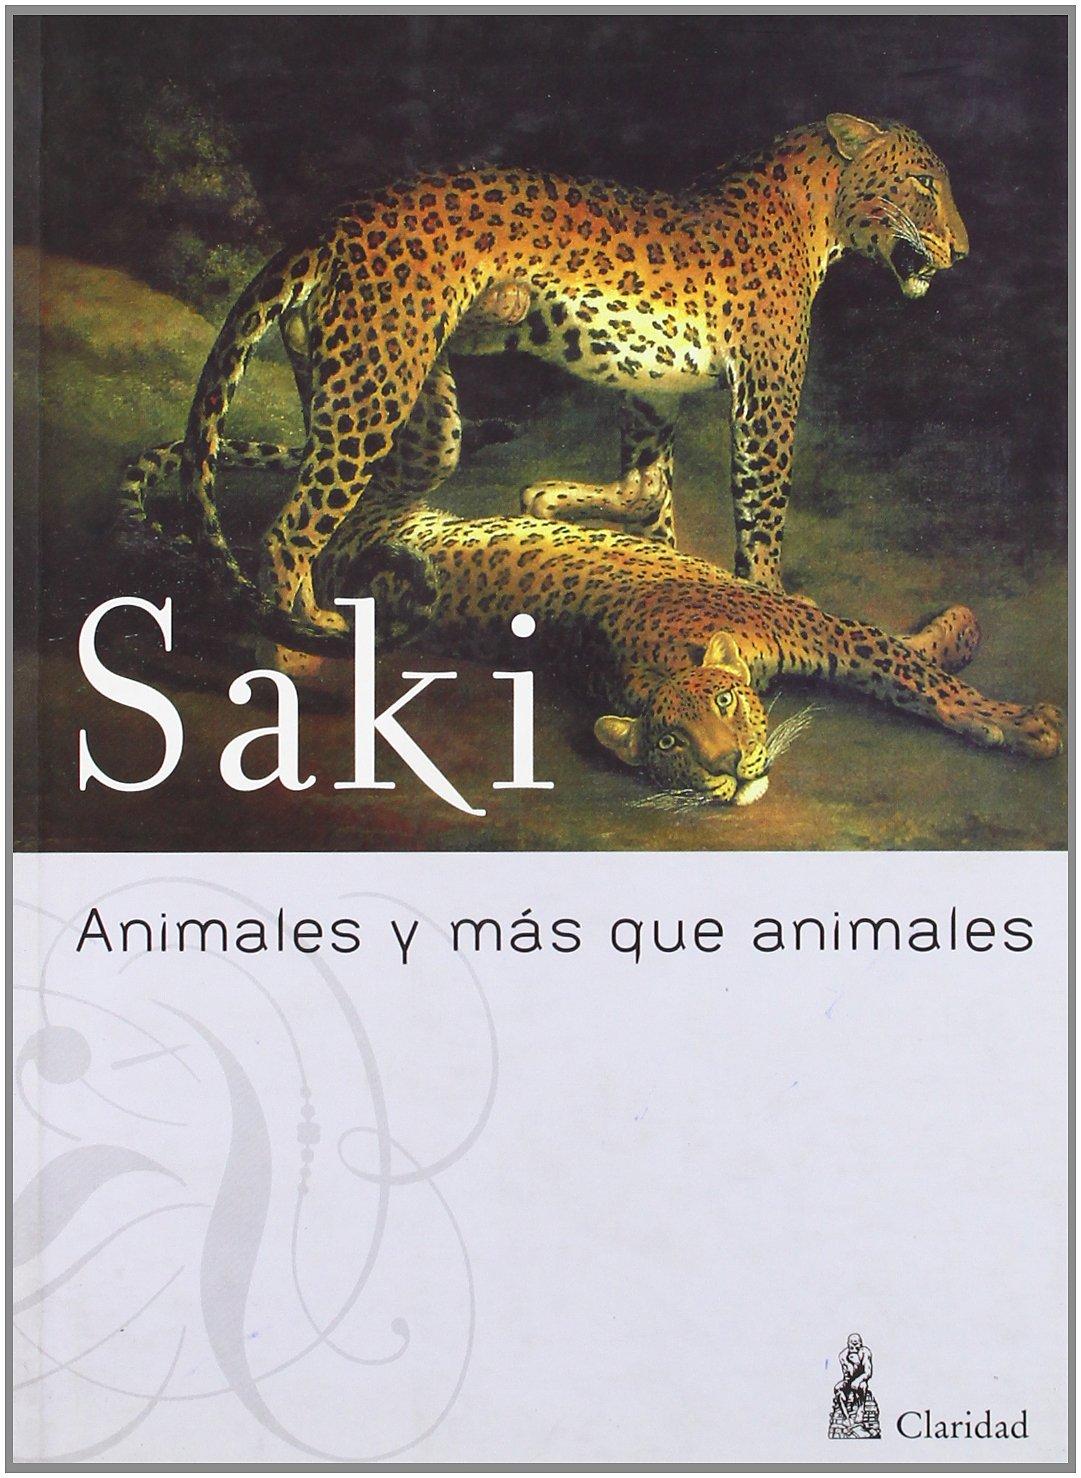 Animales y mas que animales (Spanish Edition): Saki ...